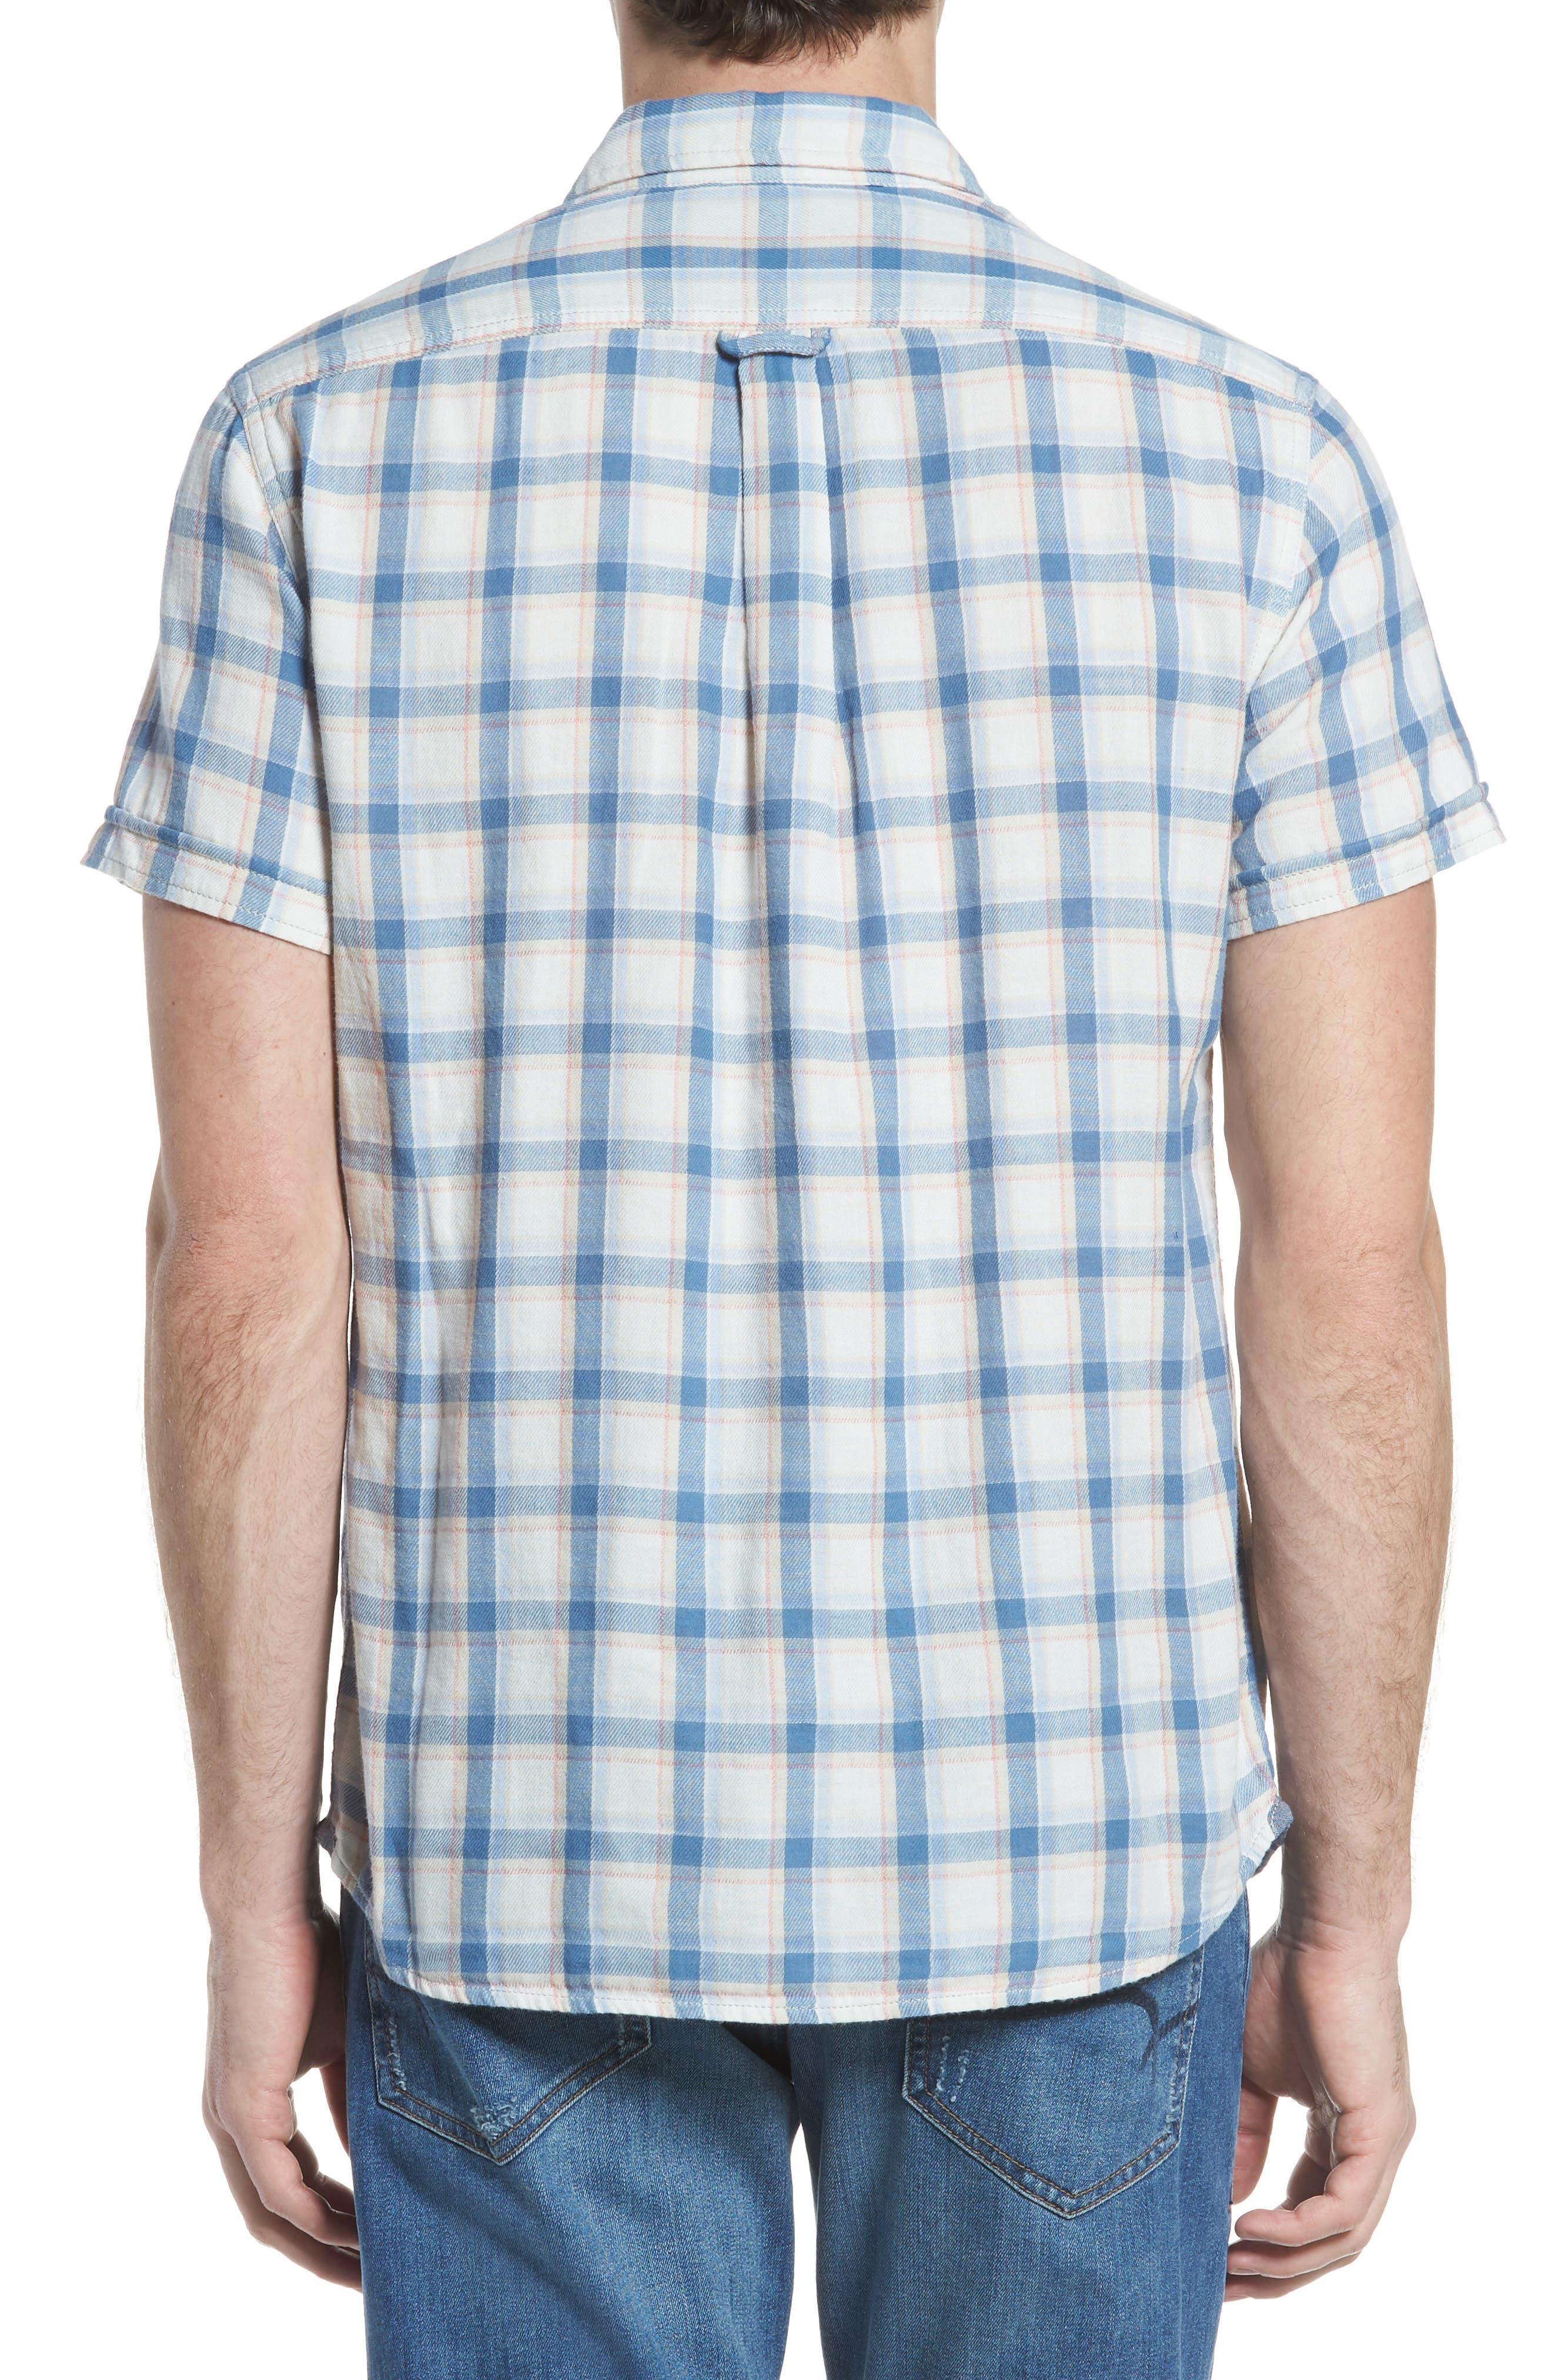 Larson Short Sleeve Sport Shirt,                             Alternate thumbnail 3, color,                             Cream Blue Plaid